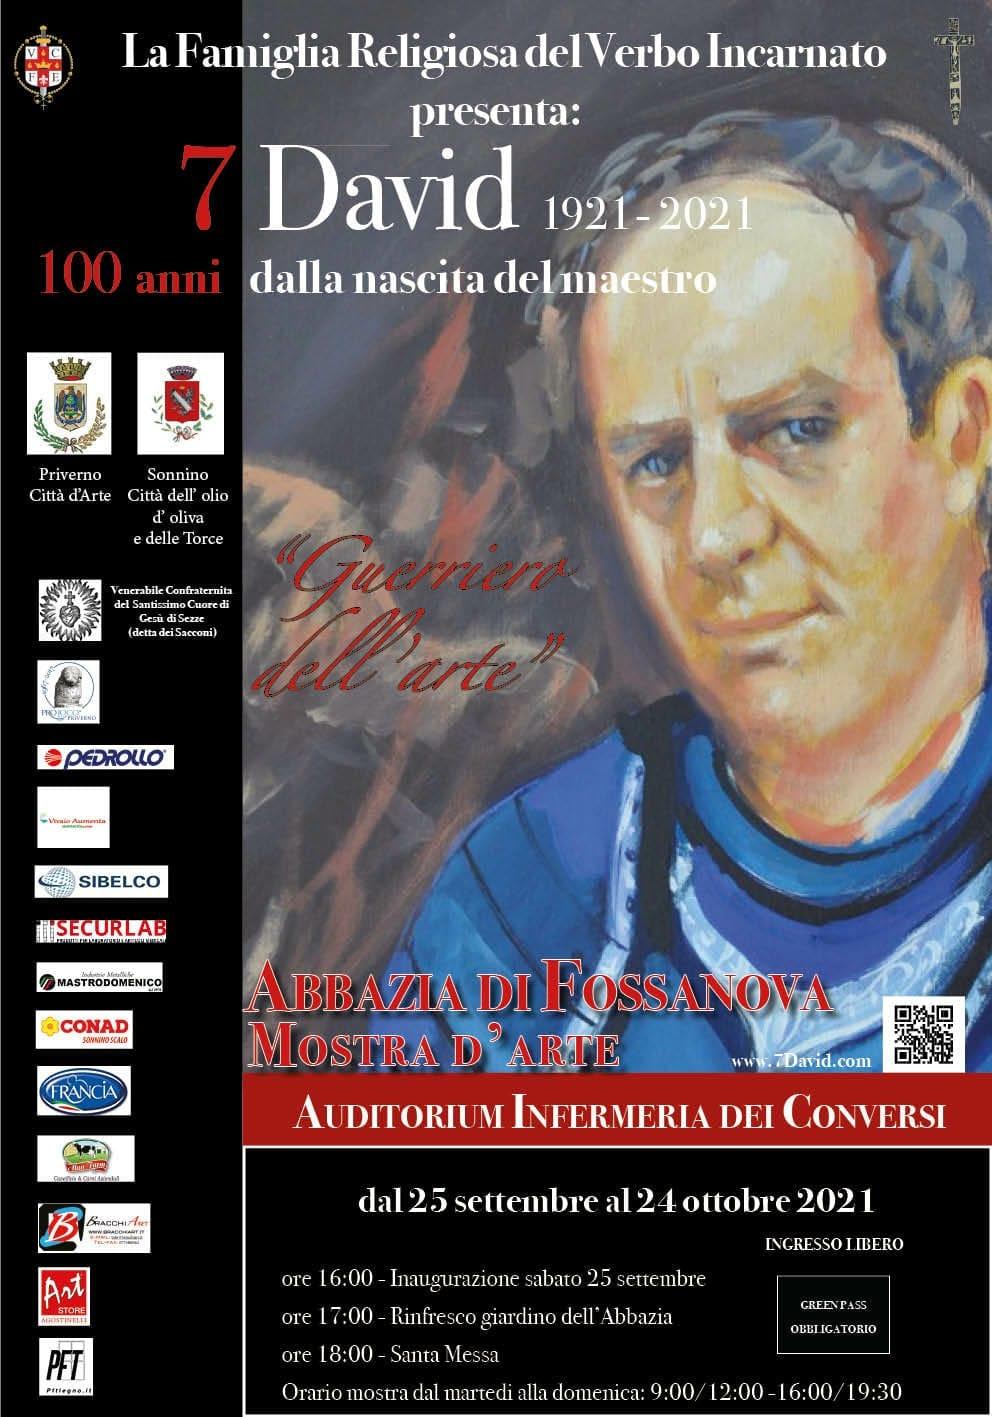 Fossanova: Mostra d'arte 7 David 1921-2021 @ Fossanova